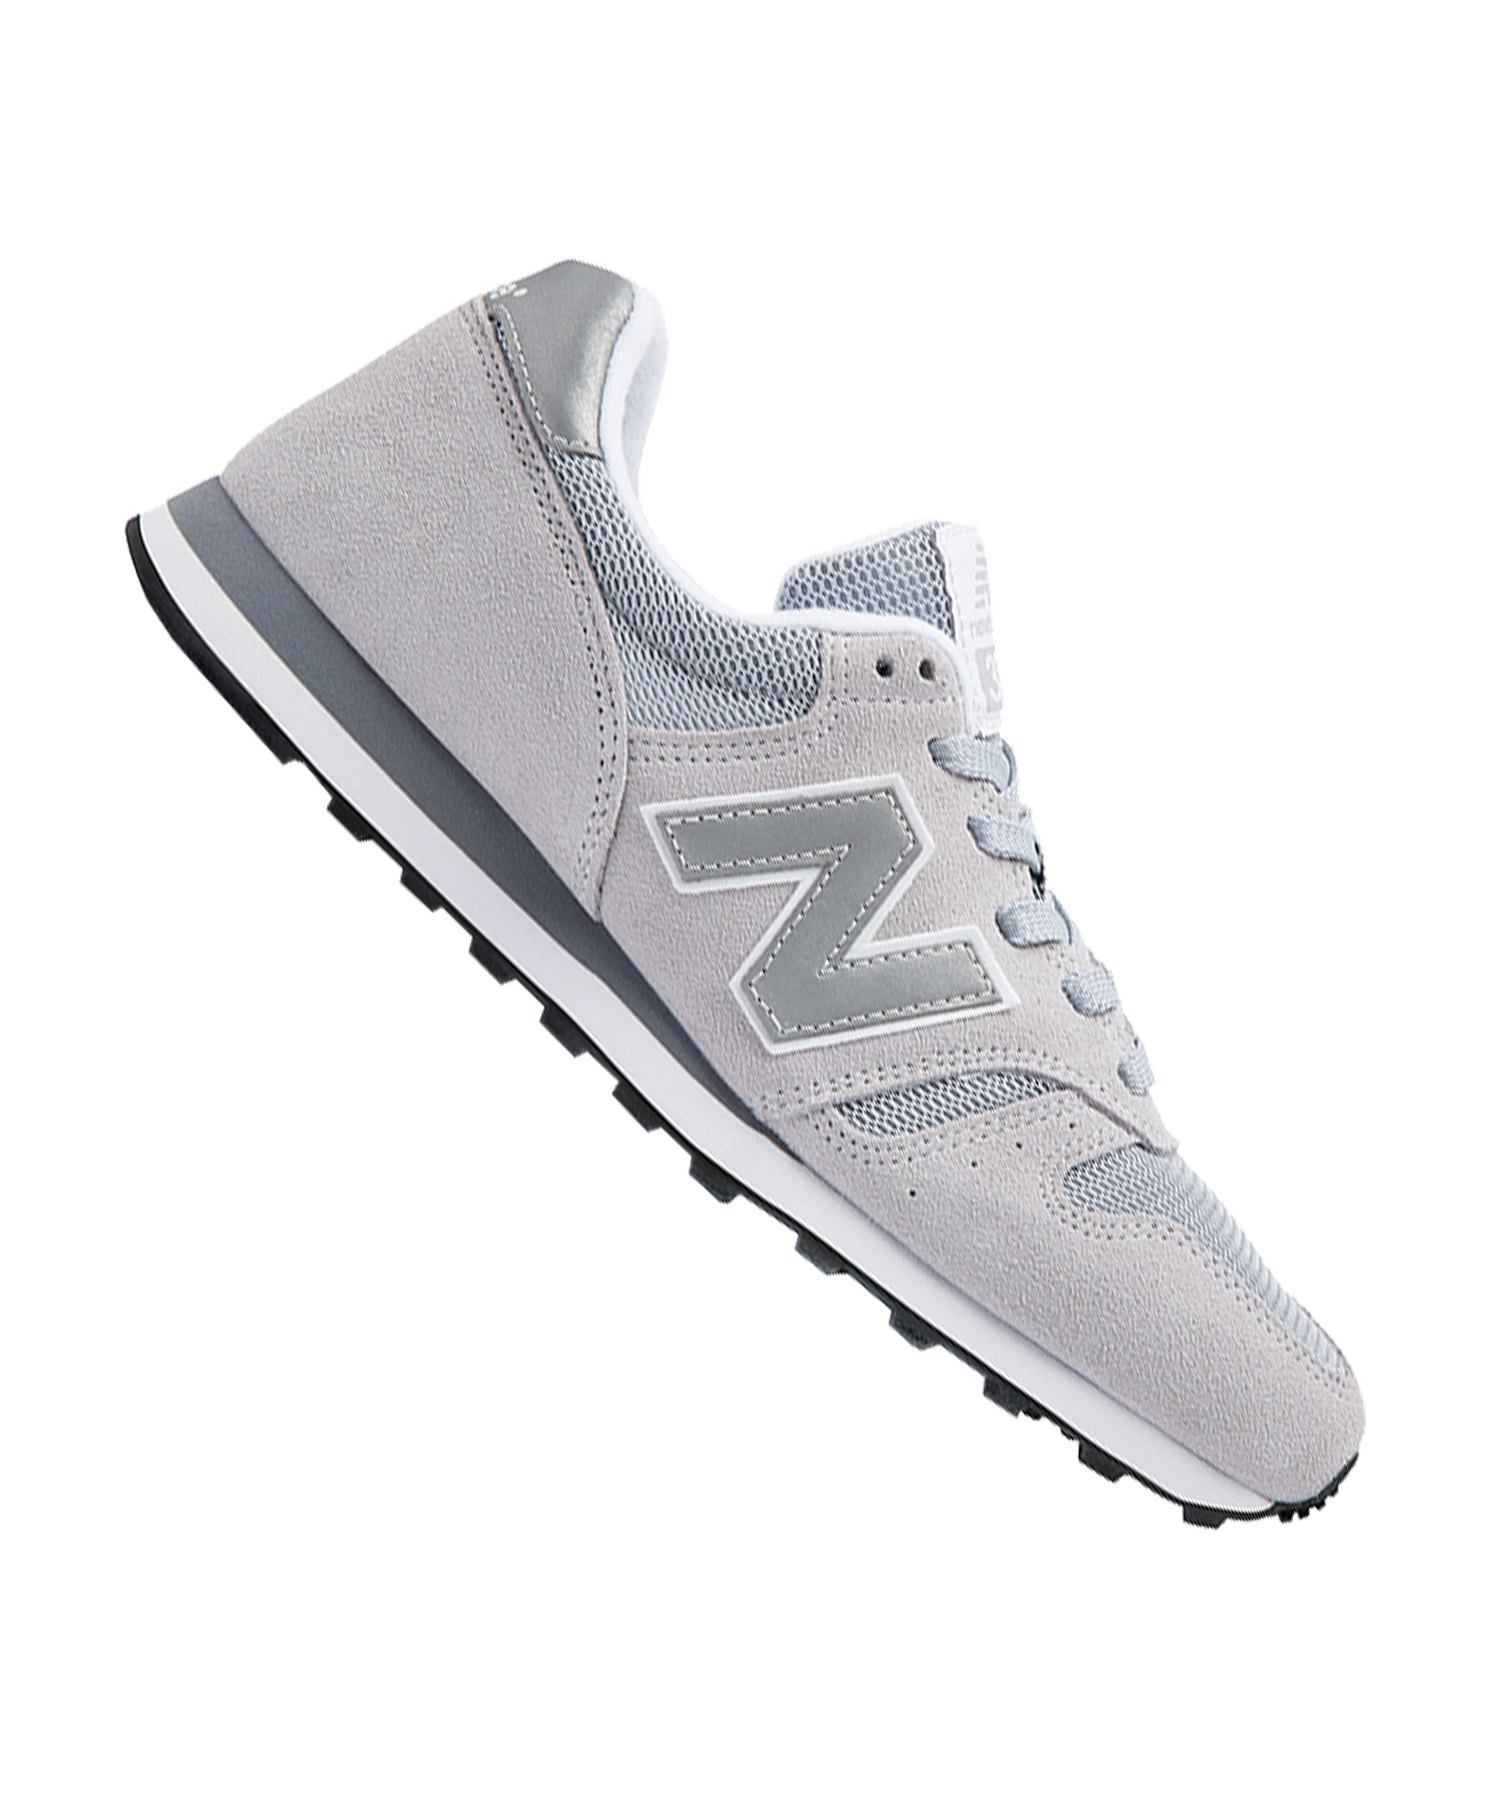 New Balance ML373 Sneaker Grau F12 - grau